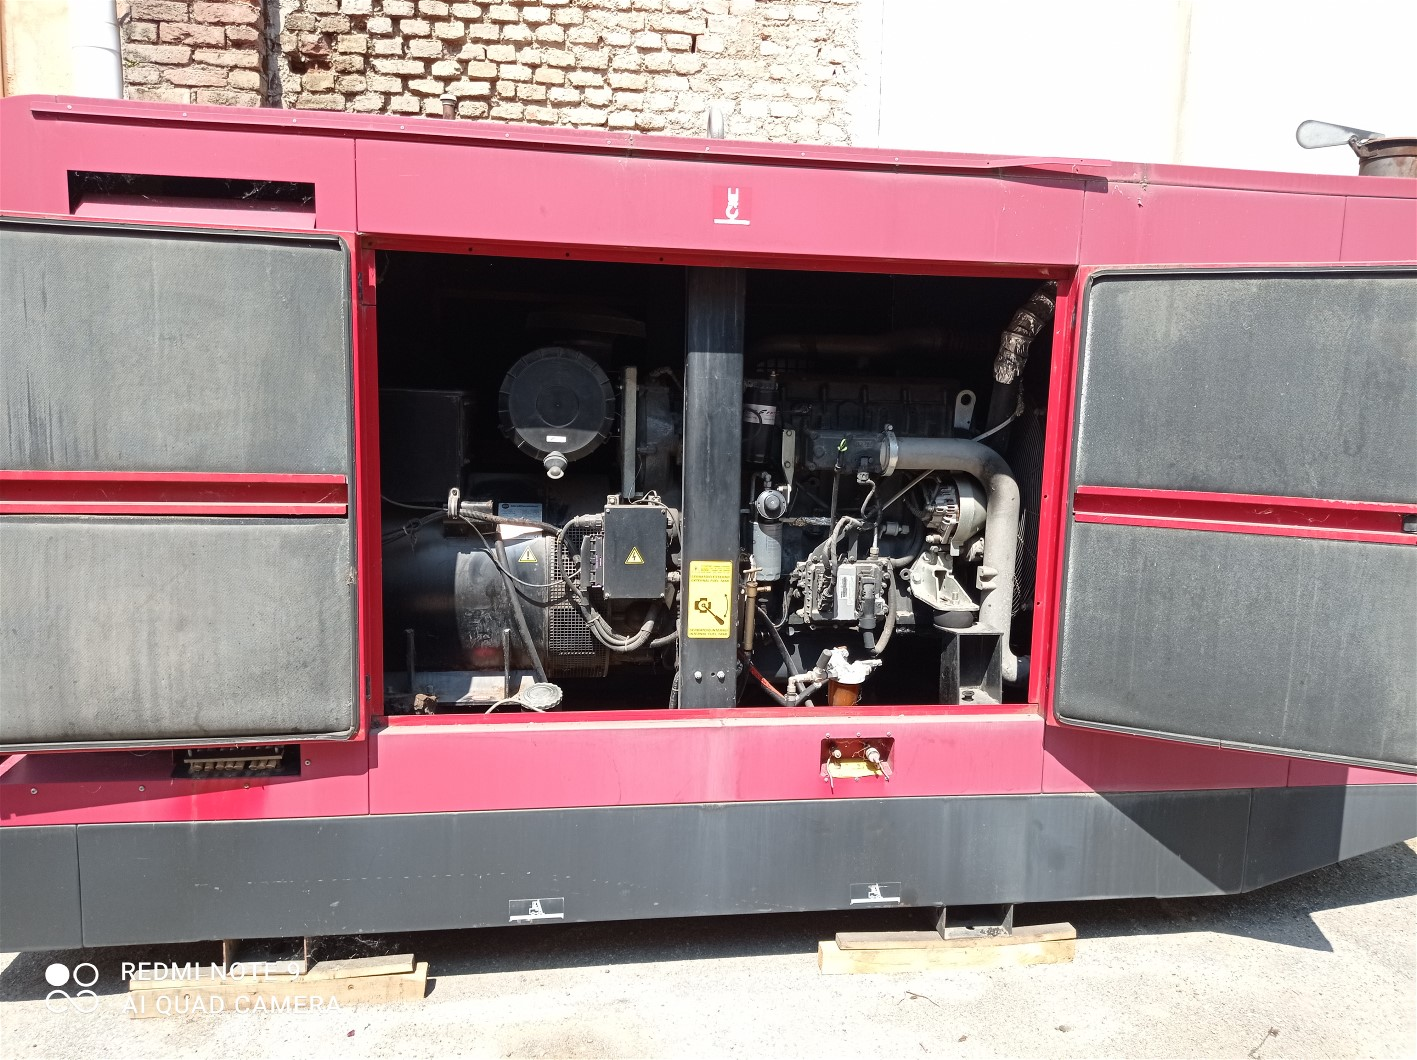 Generatore MOSA GE 305 FMSX in vendita - foto 2